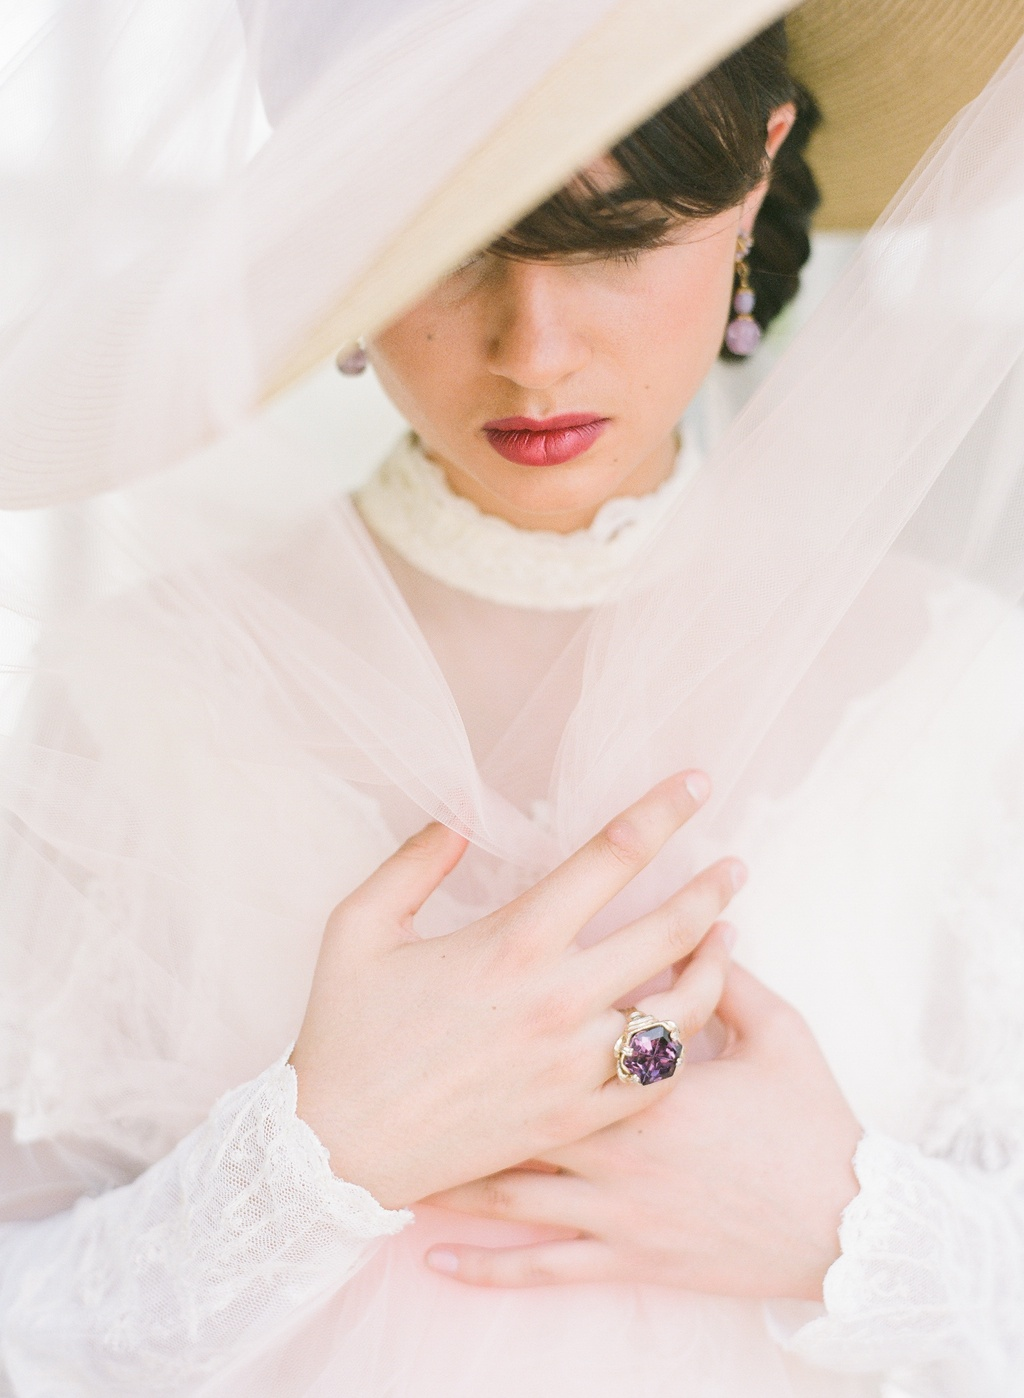 Styled-wedding-beaux-arts-tea-time-monique-lhuillier-santa-barbara-chic-bride-hat-9.full